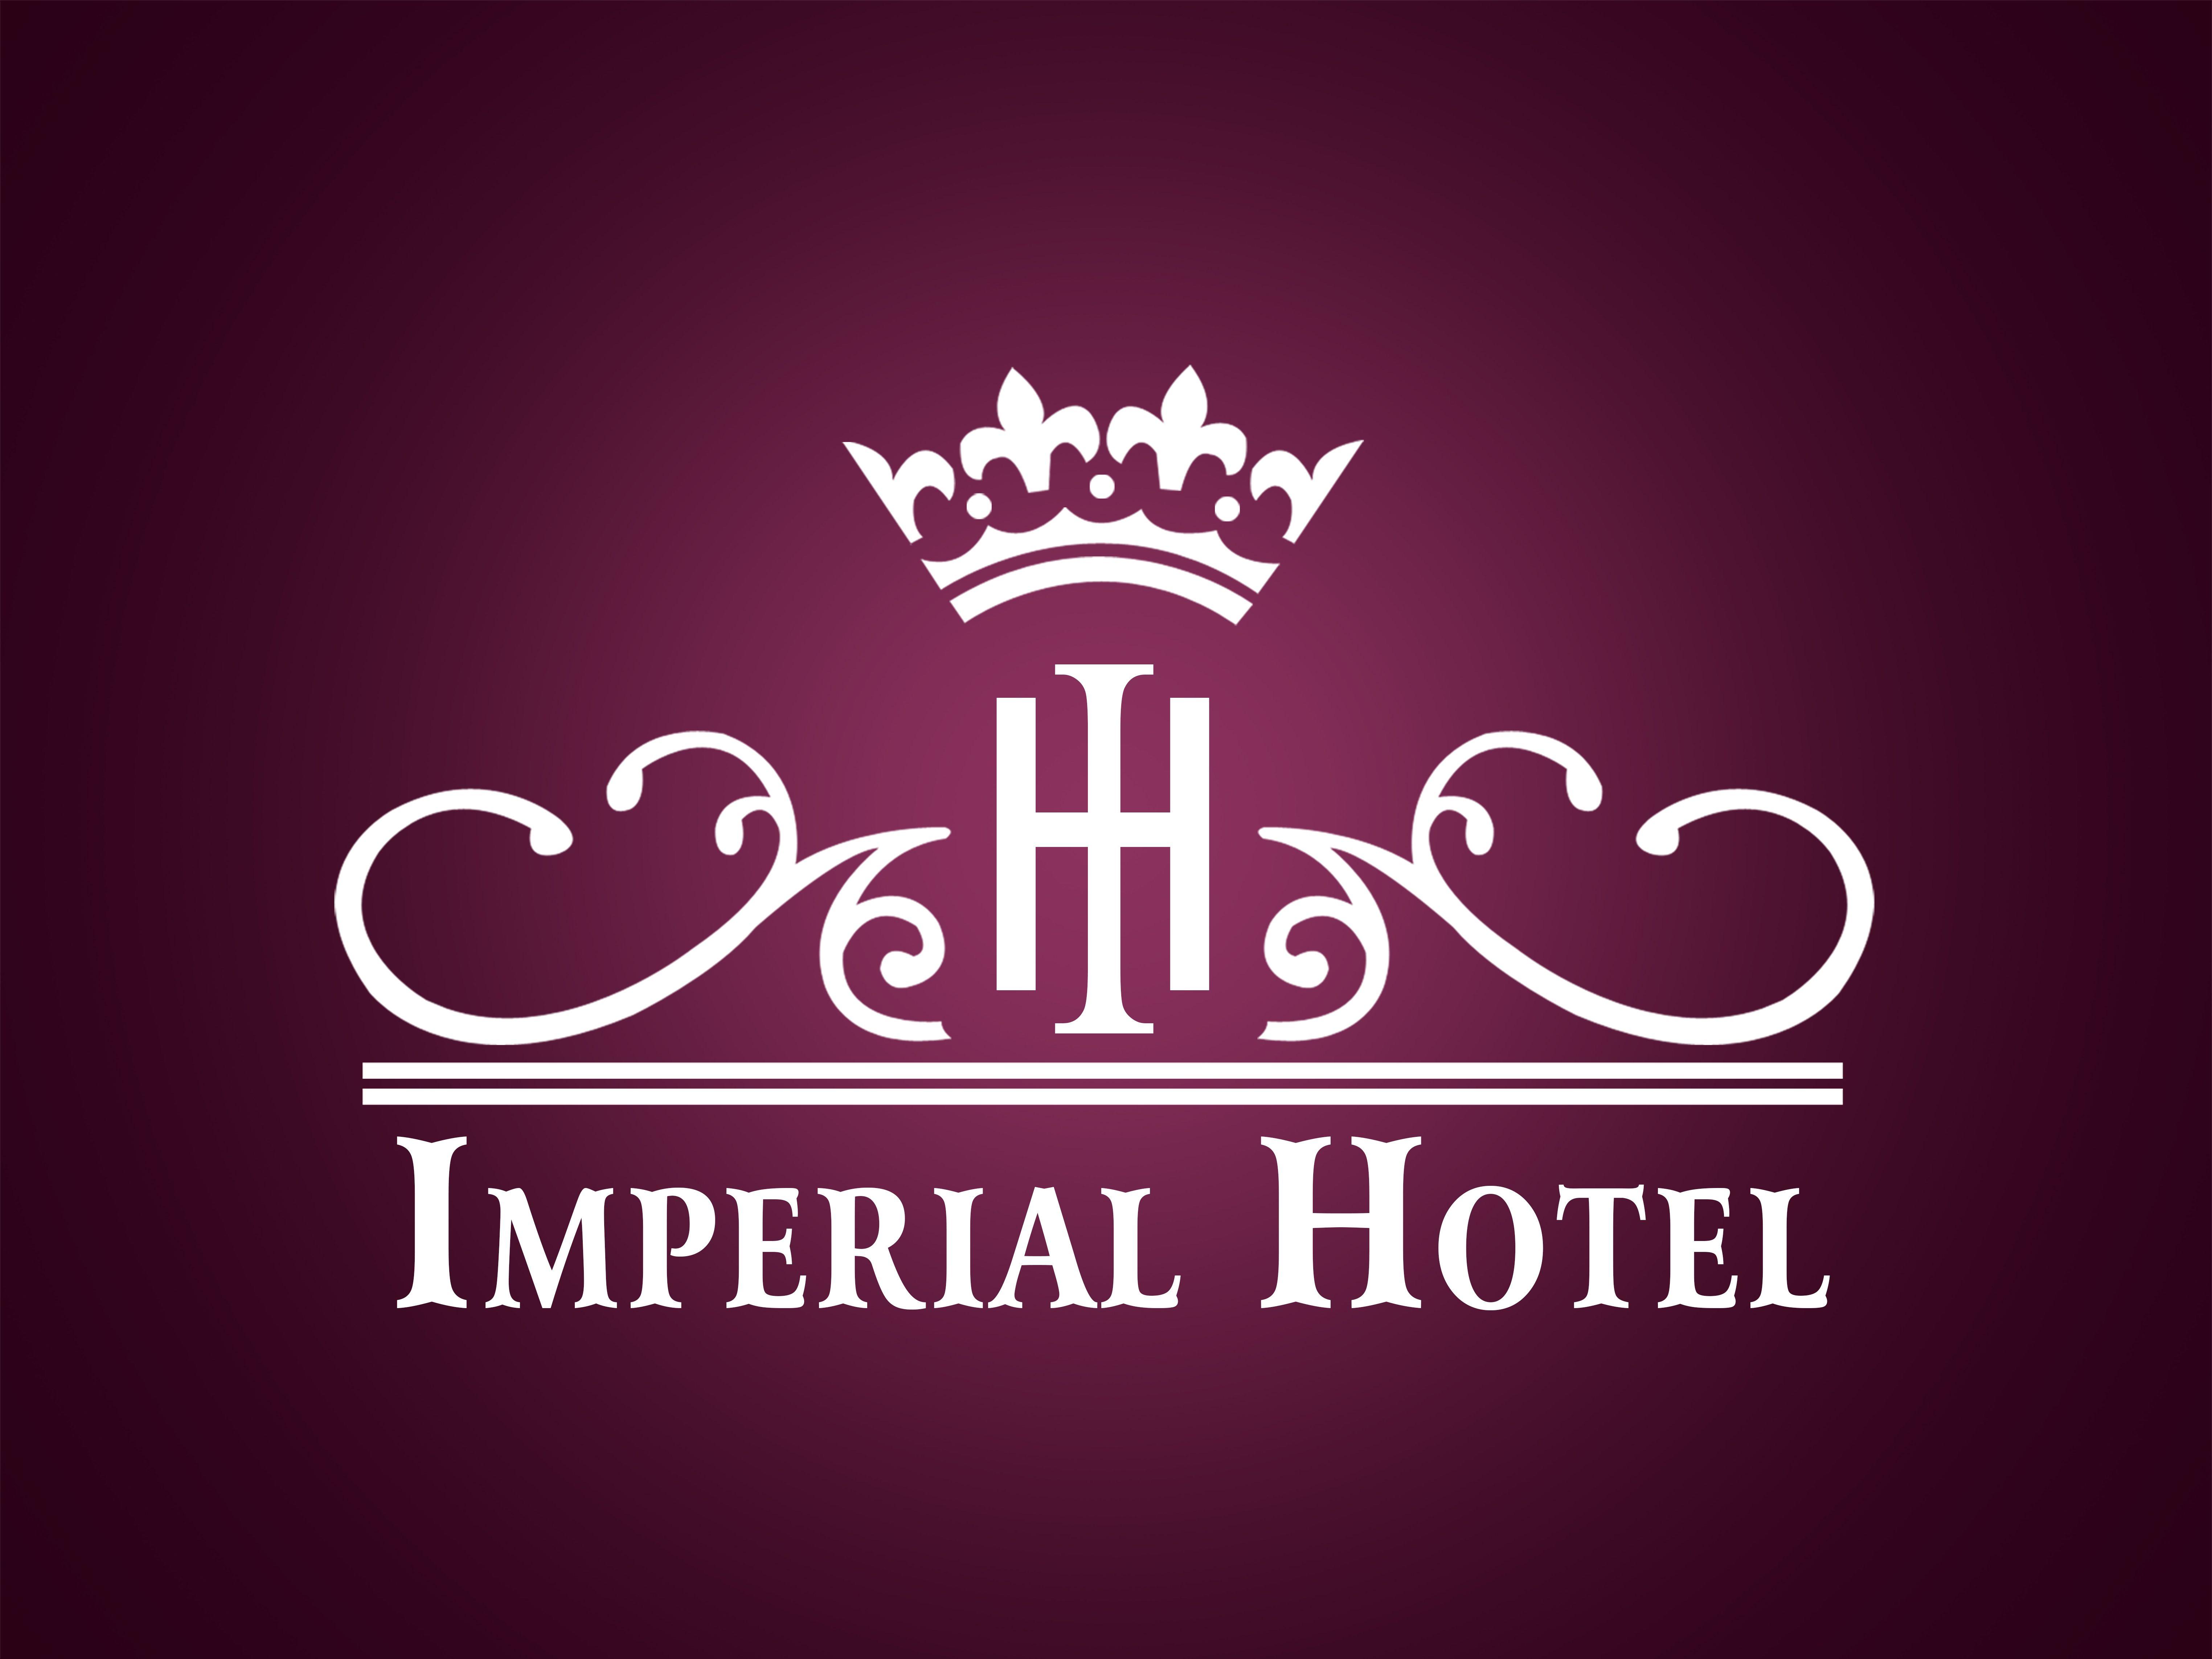 Illustrated logo | Resort logo design, Resort logo ...